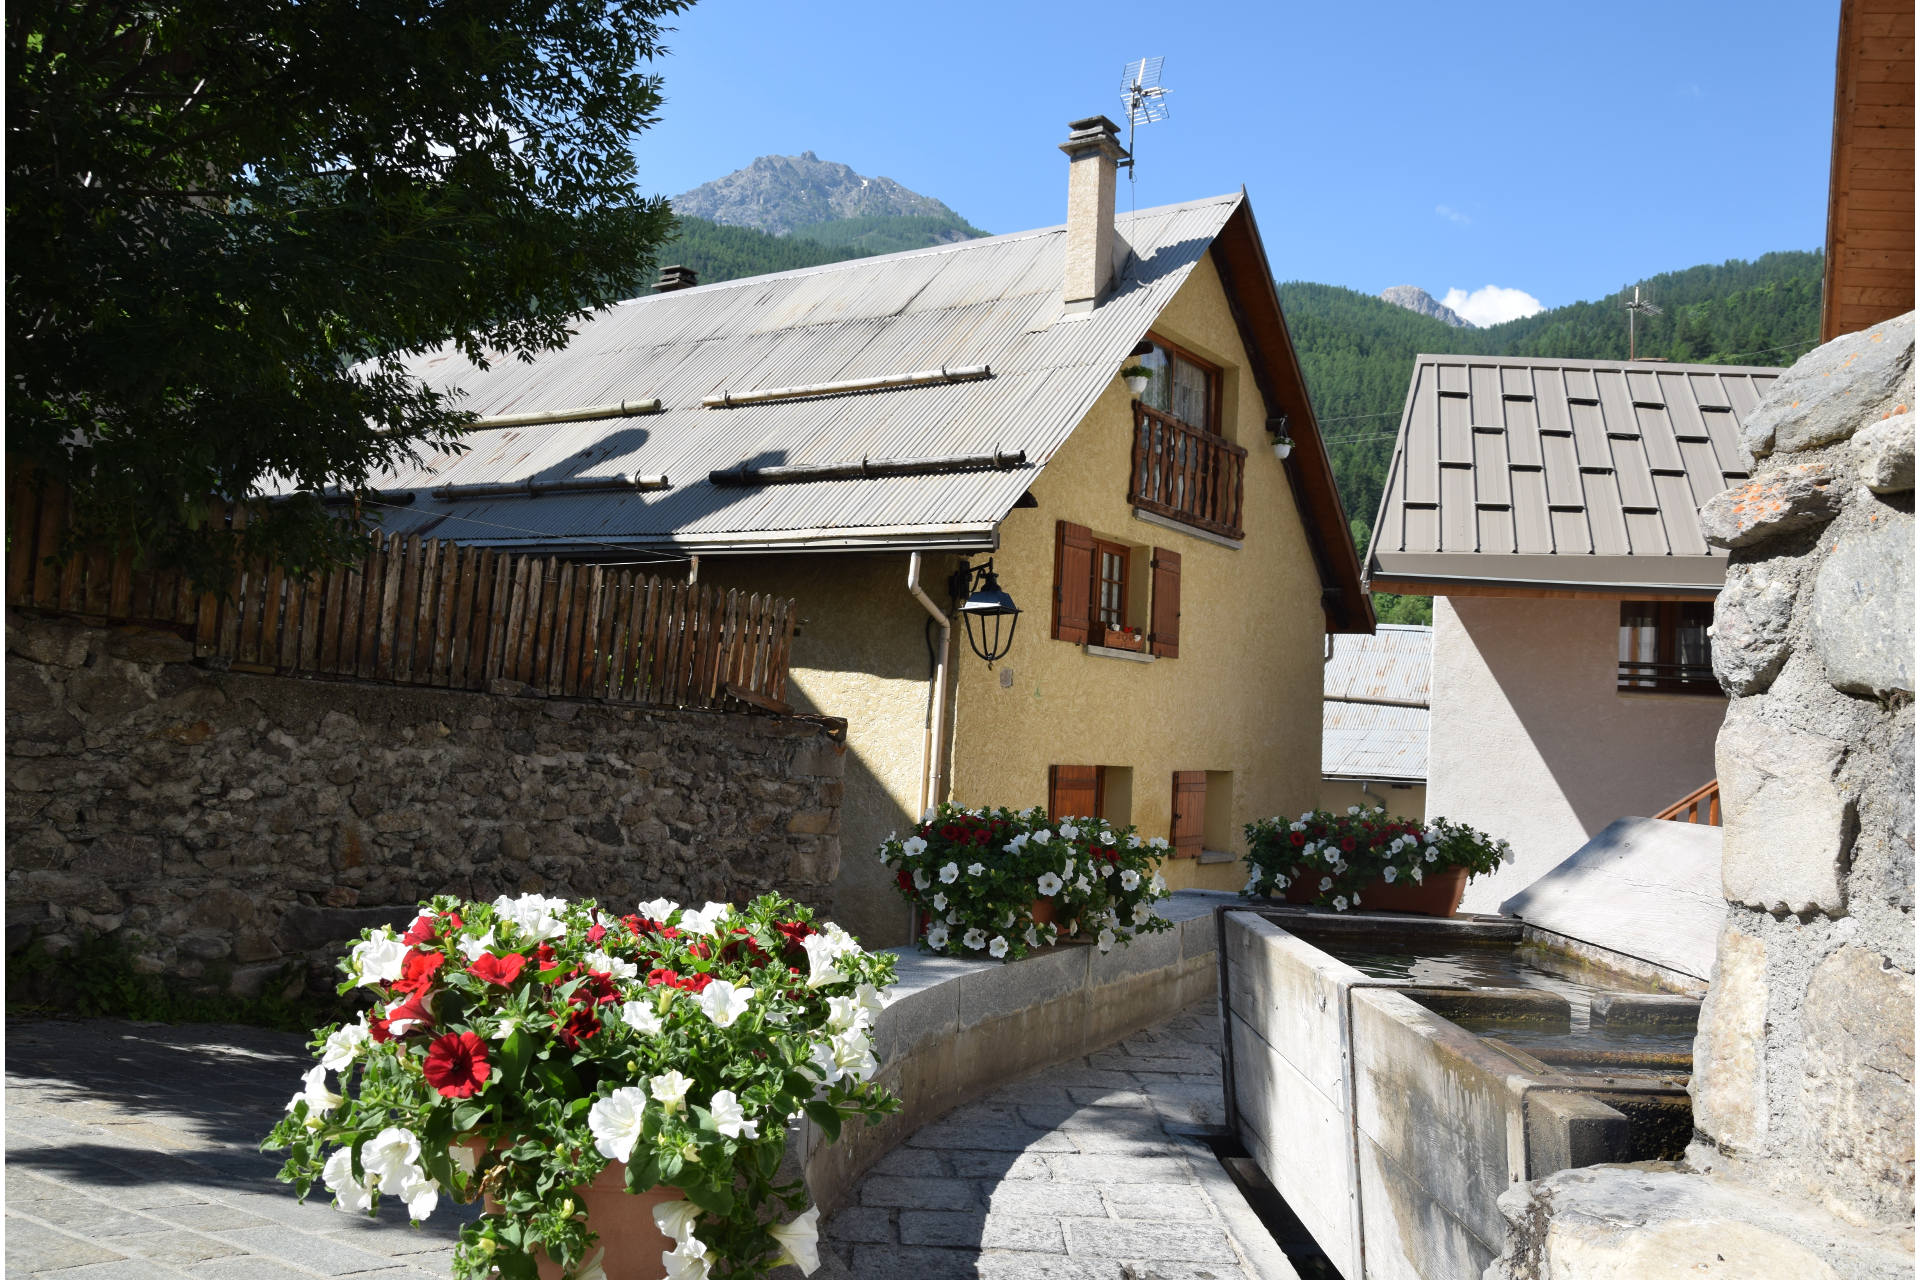 Self-catering accommodation Serre Chevalier Villeneuve